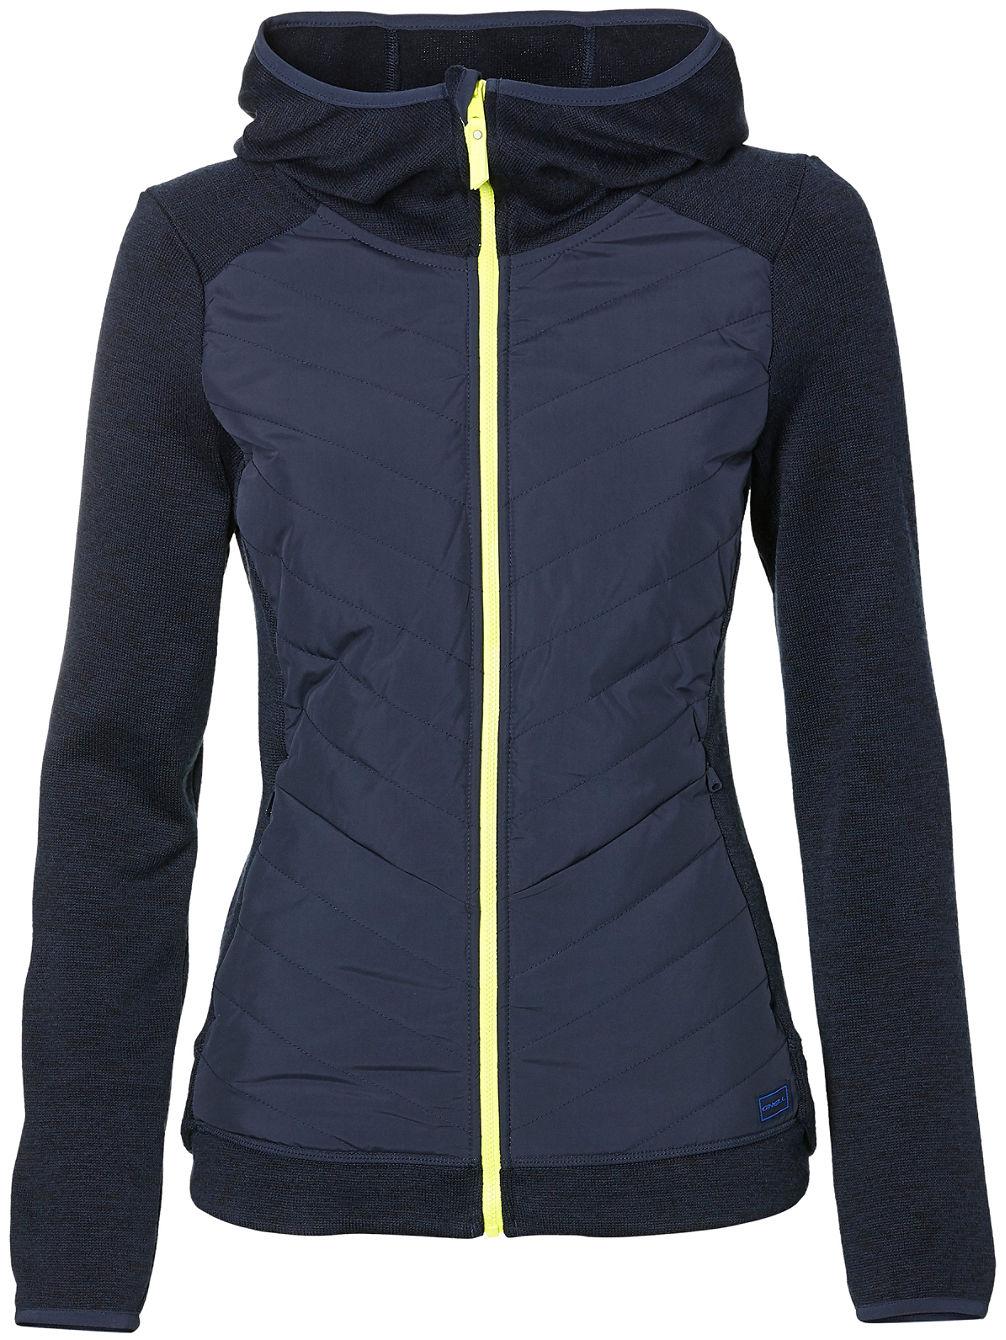 37b8cab85e268 Buy O'Neill Piste Hoodie Baffle Fleece Jacket online at Blue Tomato